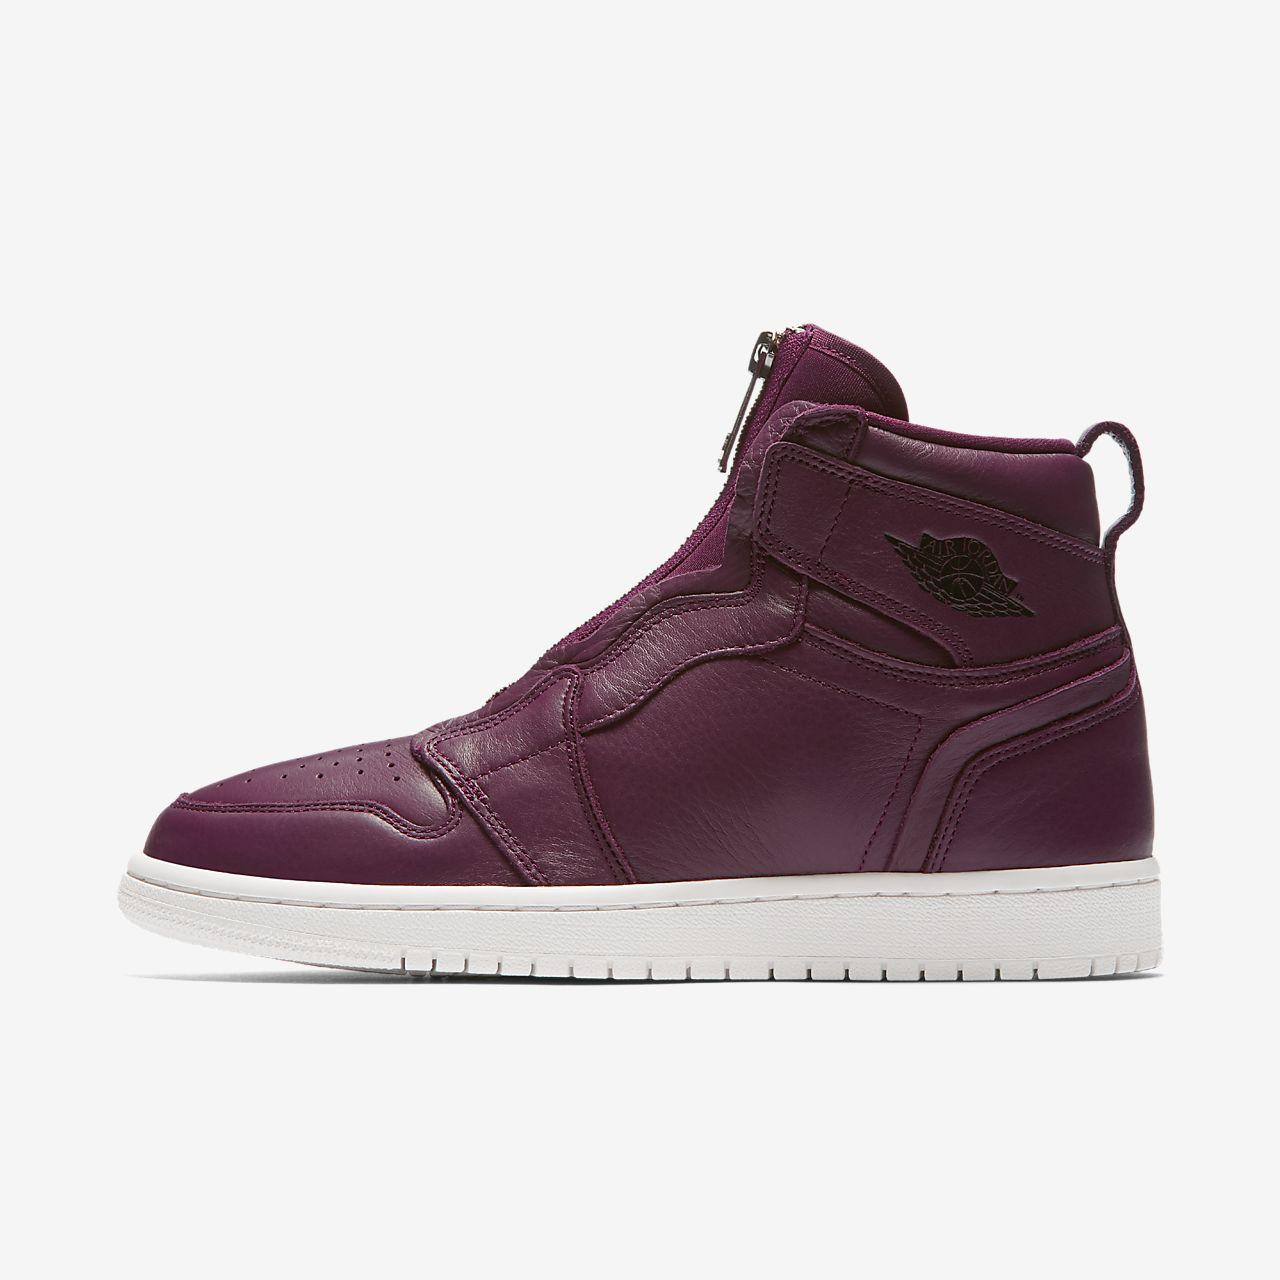 Sapatilhas Air Jordan 1 High Zip Premium para mulher